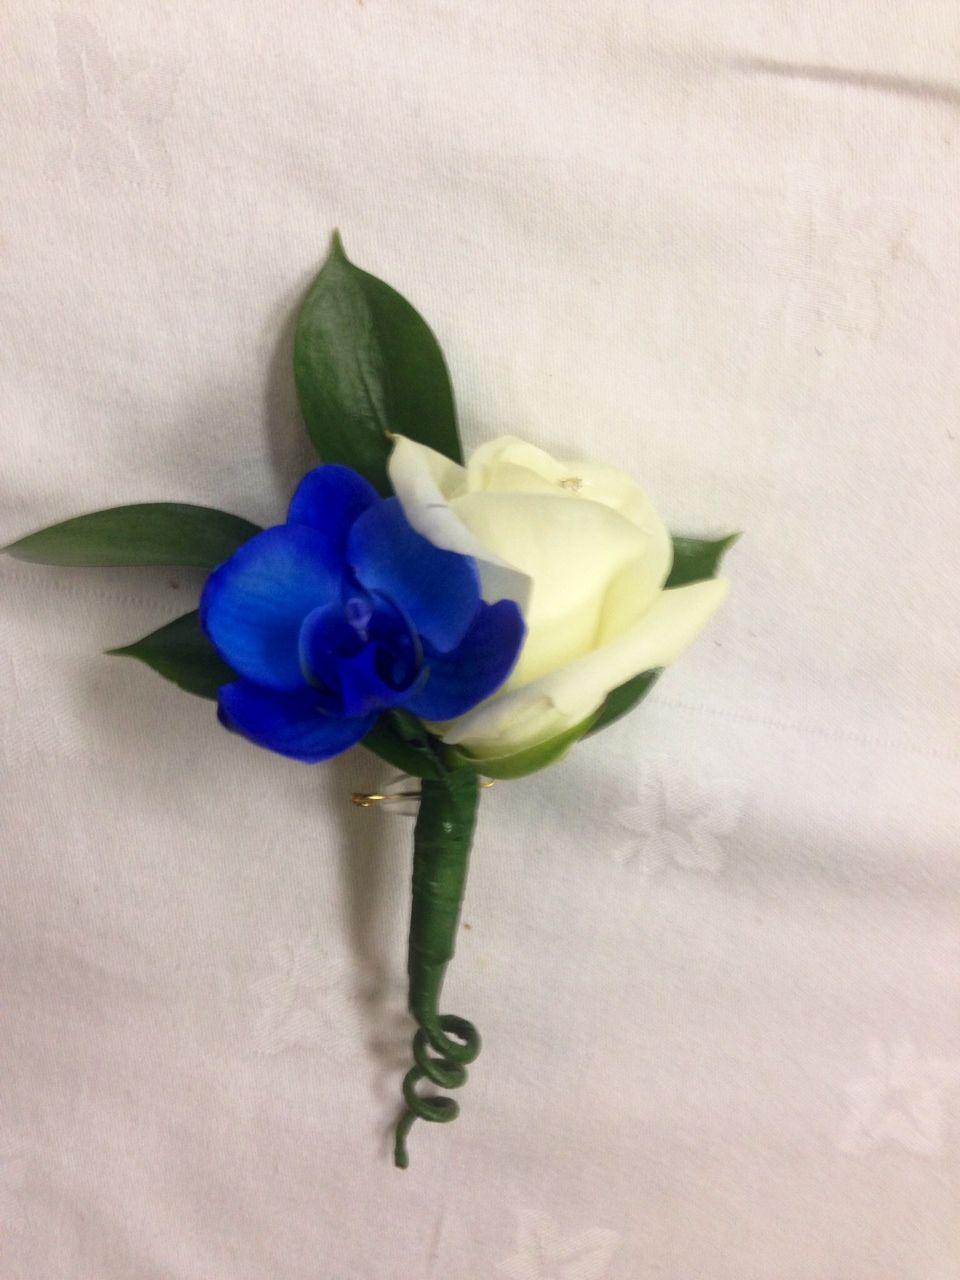 Groom S Buttonhole Gentleman S Buttonhole Boutonniere Blue Orchid White Rose Unique Wedd Unique Wedding Flowers Blue Wedding Flowers Flower Bouquet Wedding